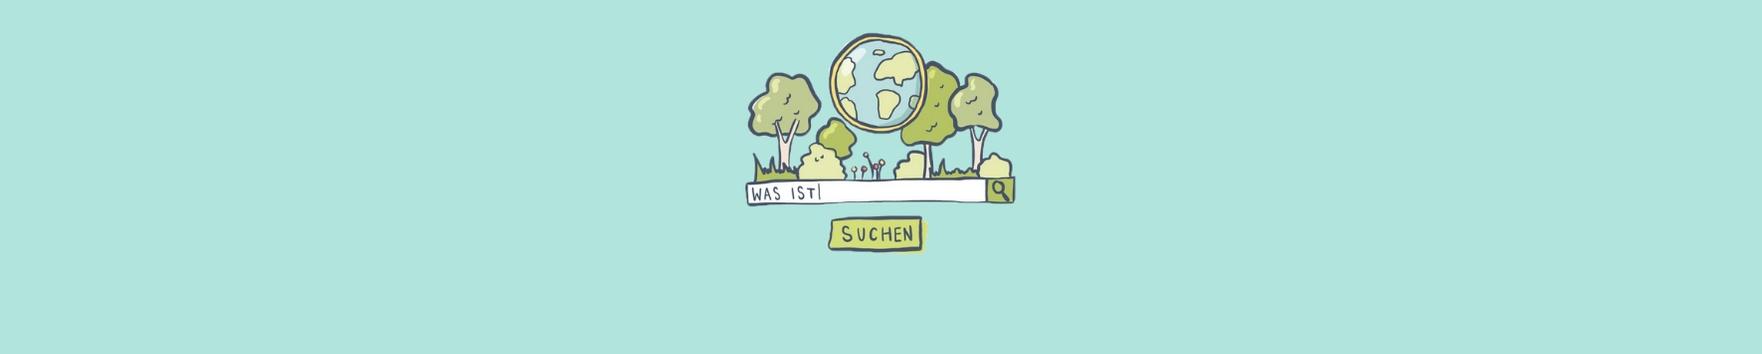 nachhaltige suchmaschine ecosia